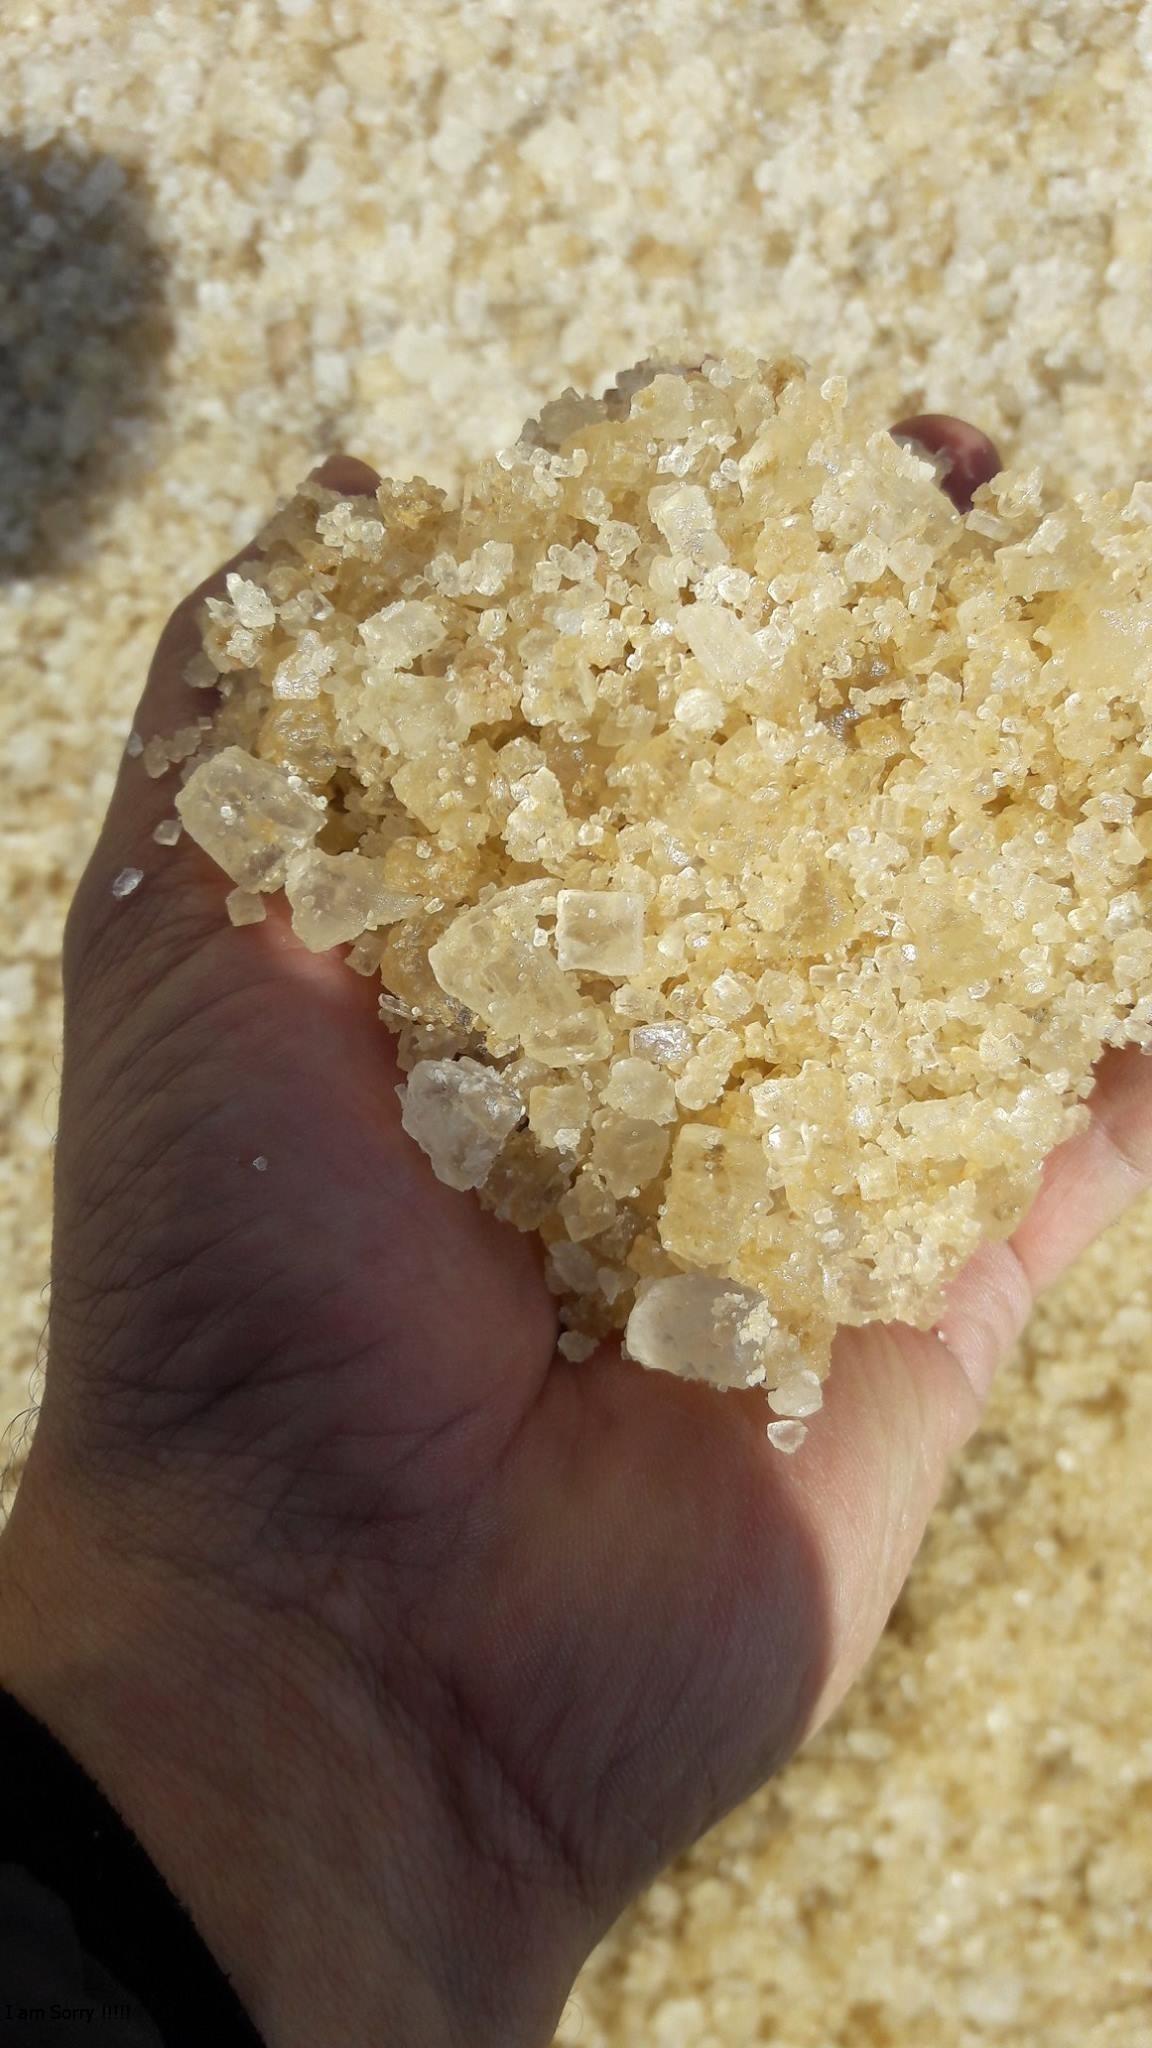 Industrial salt 1